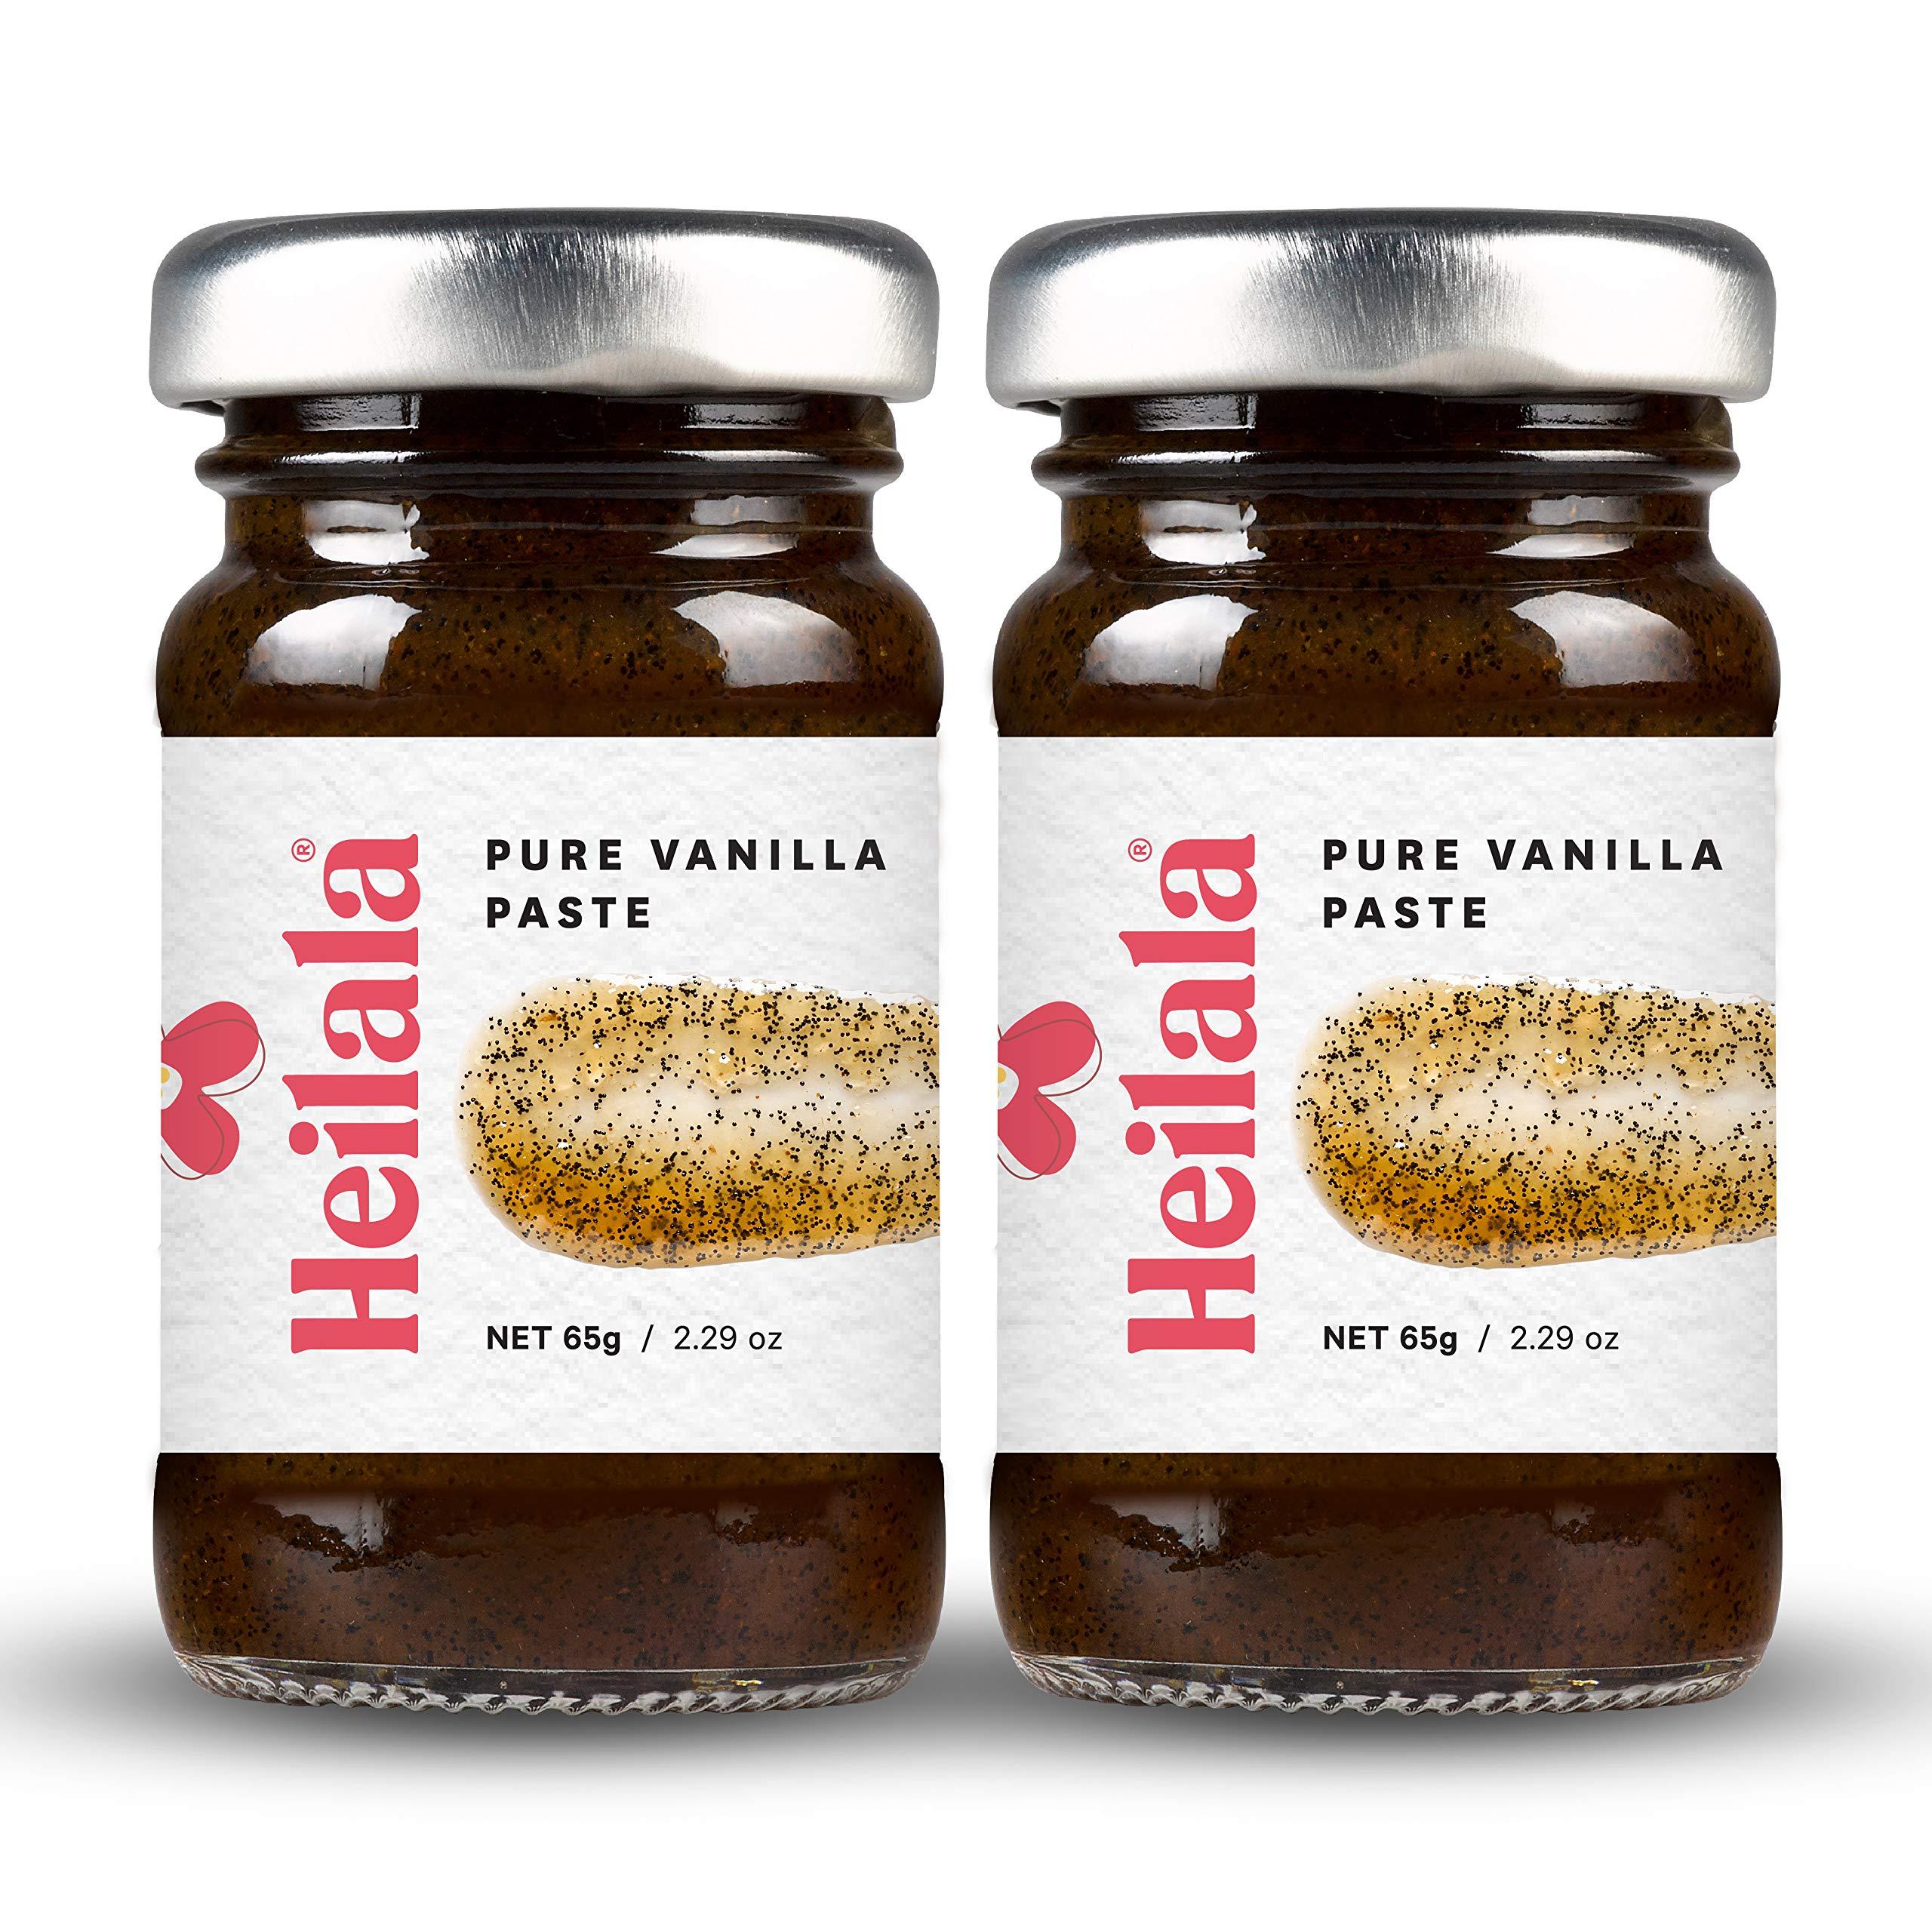 Vanilla Bean Paste for Baking - Heilala Pure Vanilla Bean Paste (2 Pack), Contains Whole Vanilla Bean Seeds